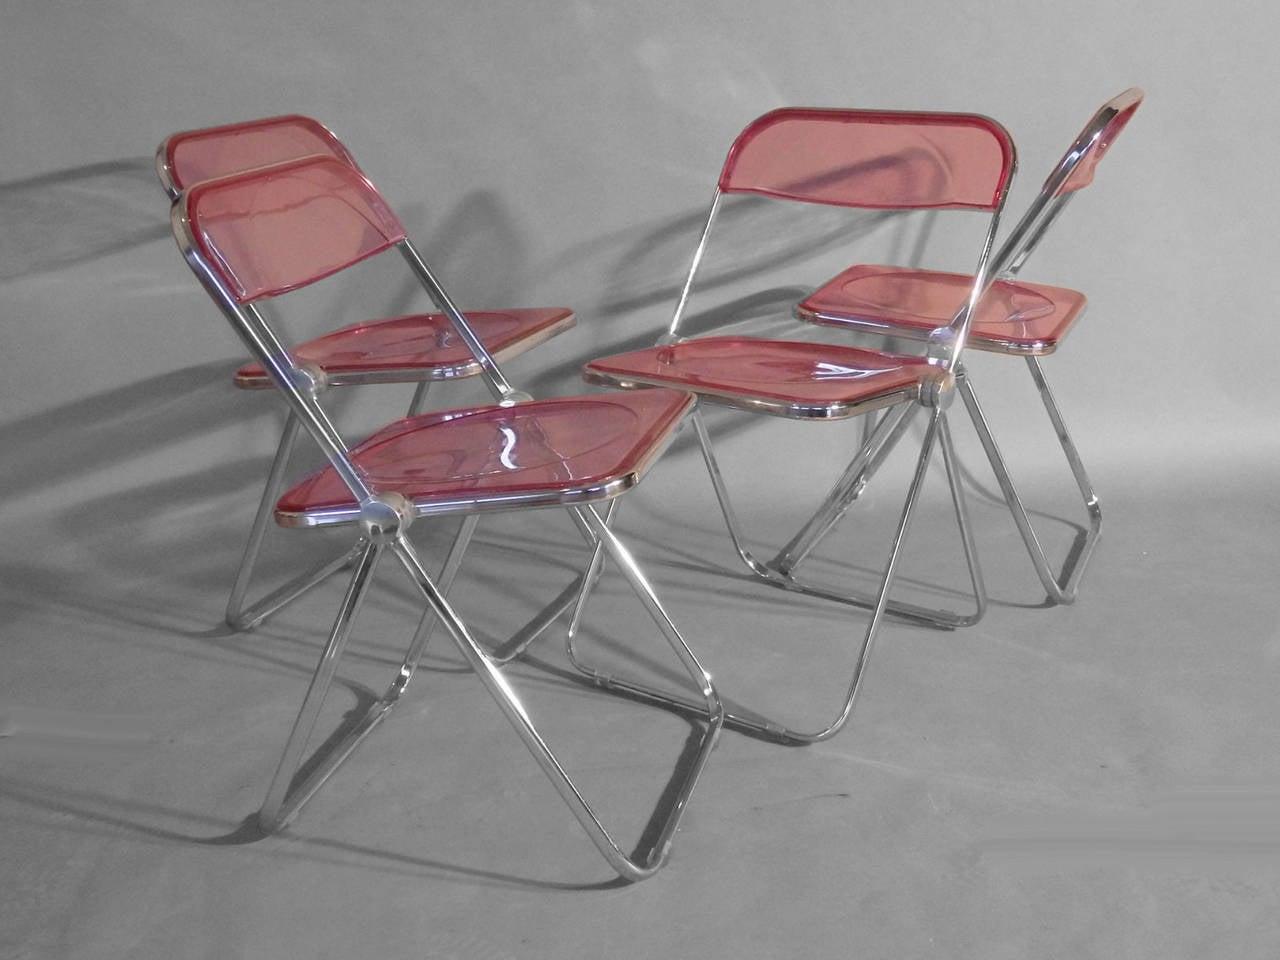 krueger folding chairs bruno chair lift maintenance set of four plia lucite aluminum and chrome